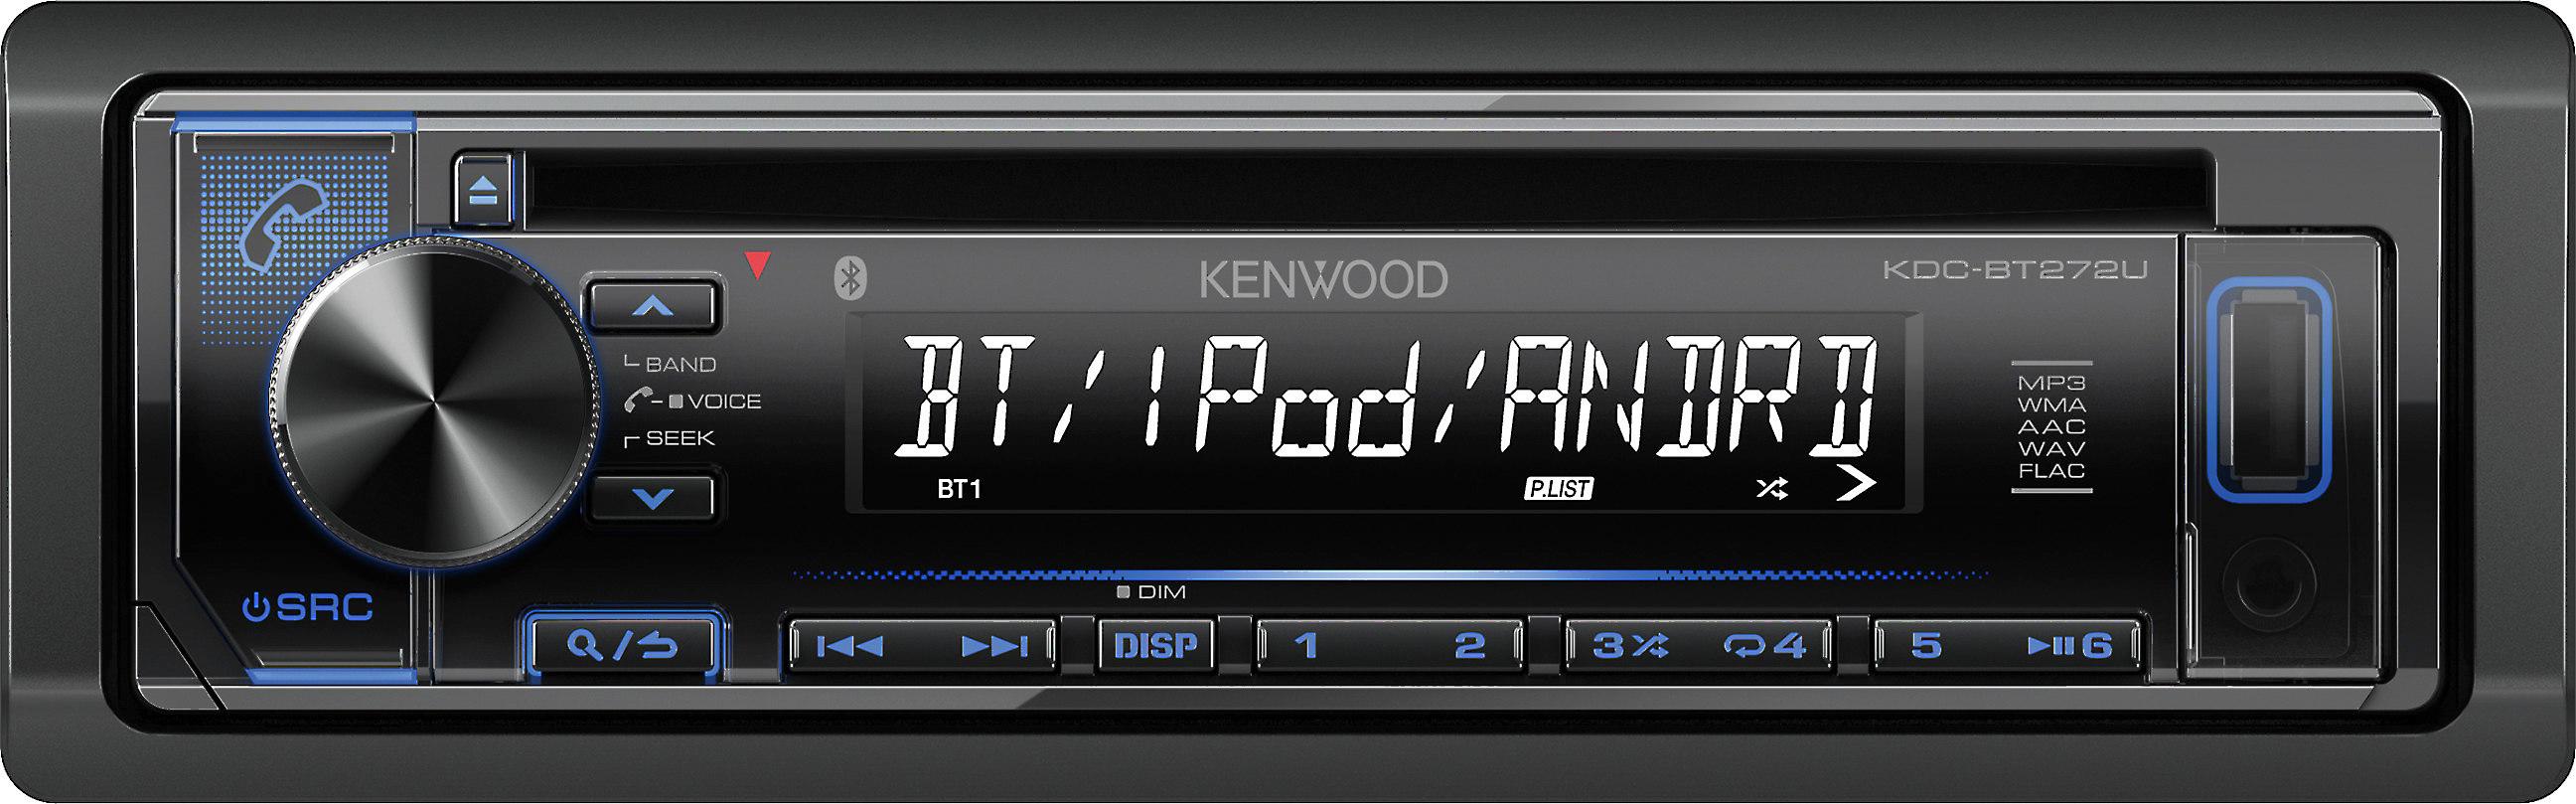 Kenwood Car Stereo Wiring Diagram Bt272u on kenwood kdc, kenwood excelon wiring-diagram, kenwood car radio manuals, boss audio wiring diagram, kenwood car stereo wire harness, radio block diagram, 5 channel car amplifier wiring diagram, kenwood car radio accessories, kenwood wiring harness colors, stereo diagram, kenwood radio wiring colors, kenwood car radio code, kenwood ddx7017 wiring-diagram, kenwood car stereo touch screen, kenwood car stereo product, home audio wiring diagram, kenwood car radio remote control, trailer wiring diagram, water heater wiring diagram, kenwood harness diagram,